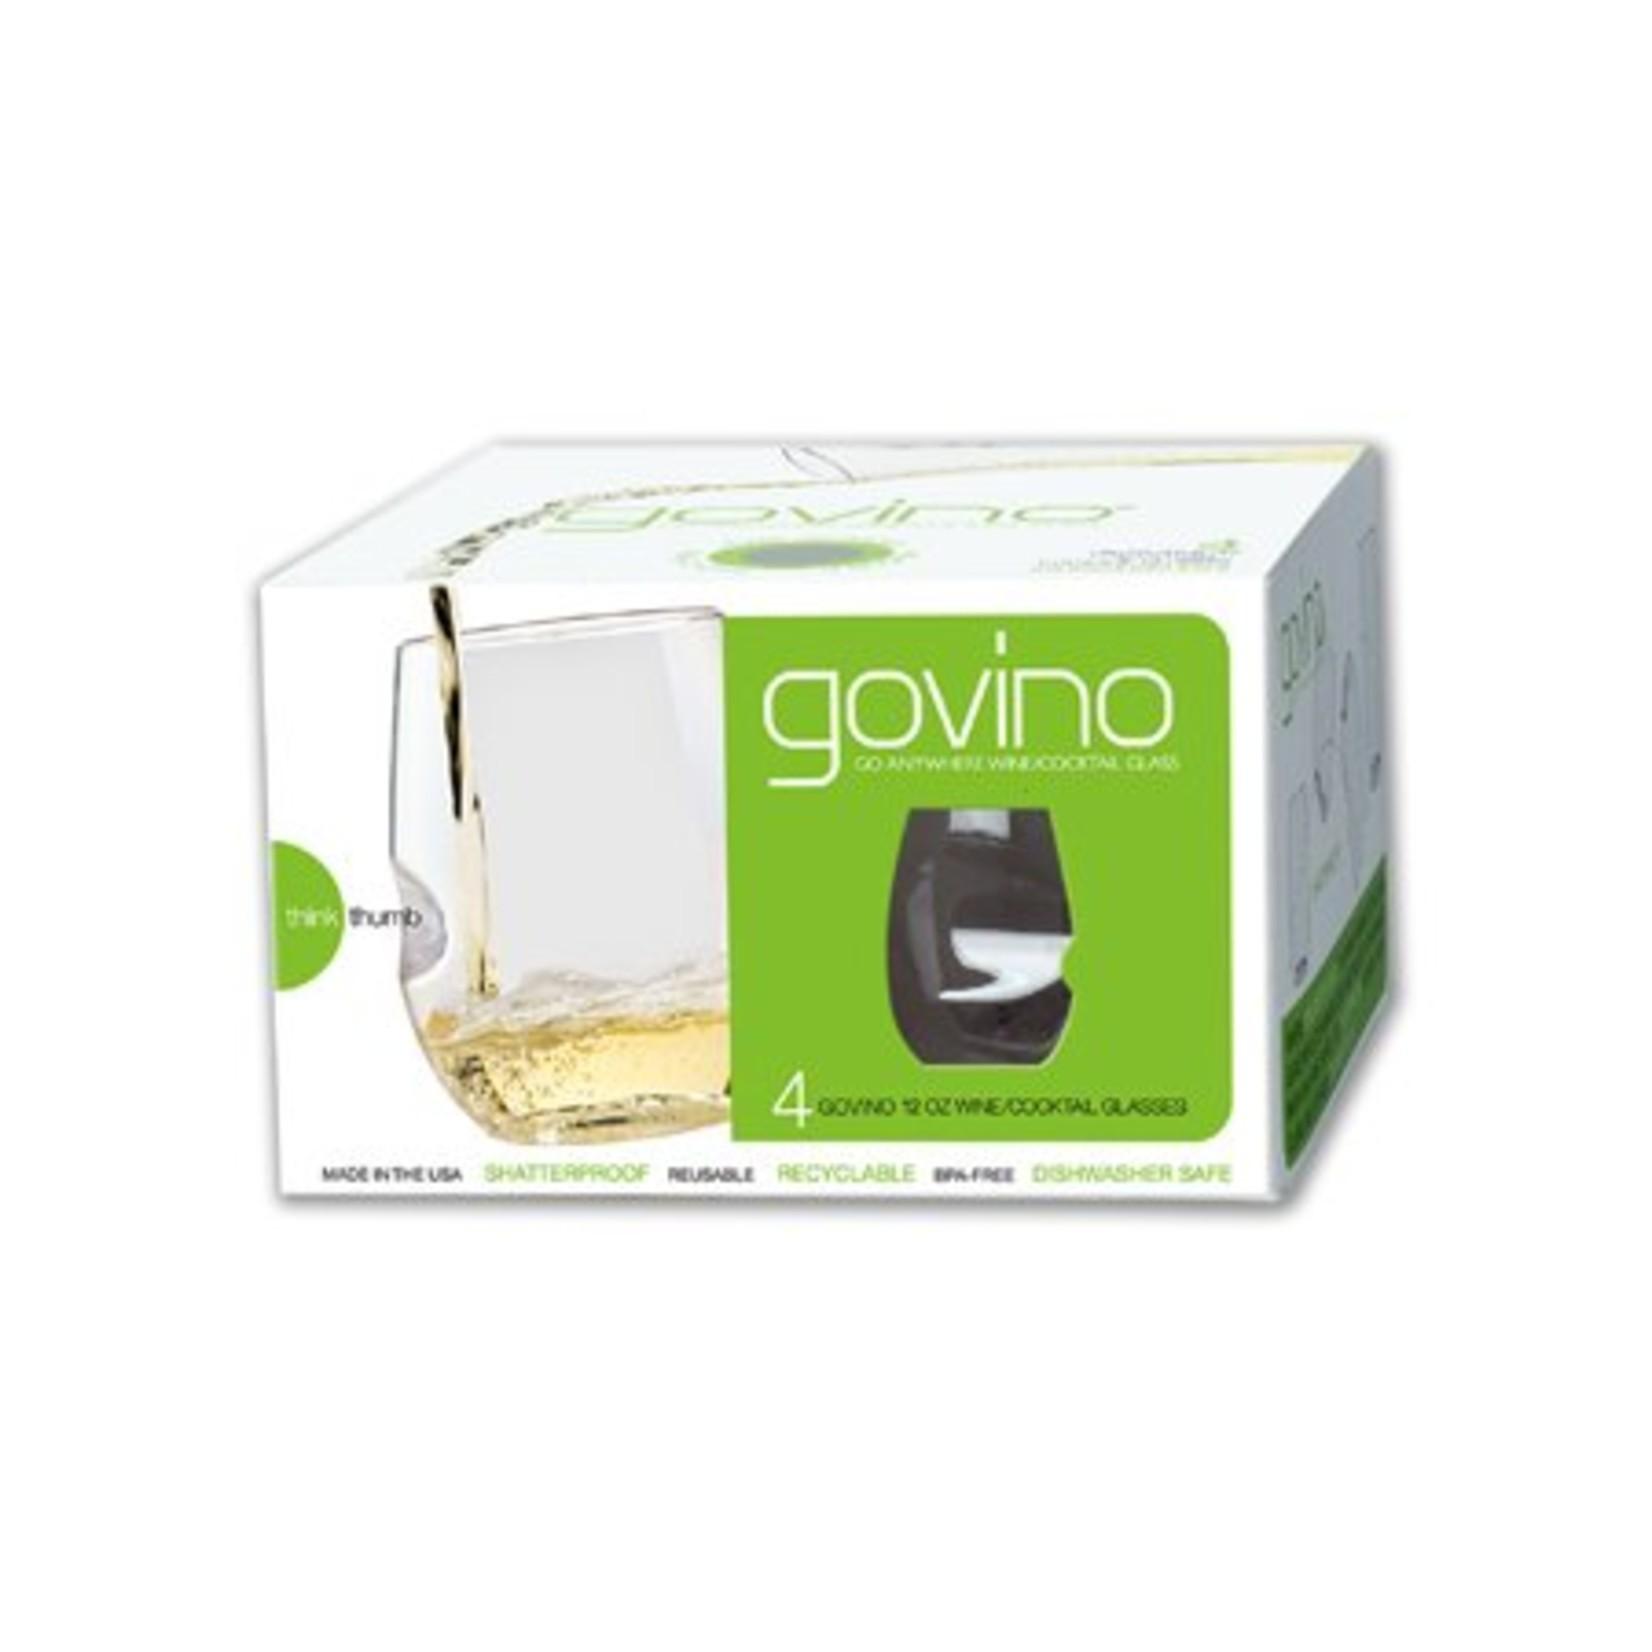 Govino 12oz Wine/Cocktail Glass 4 Pack